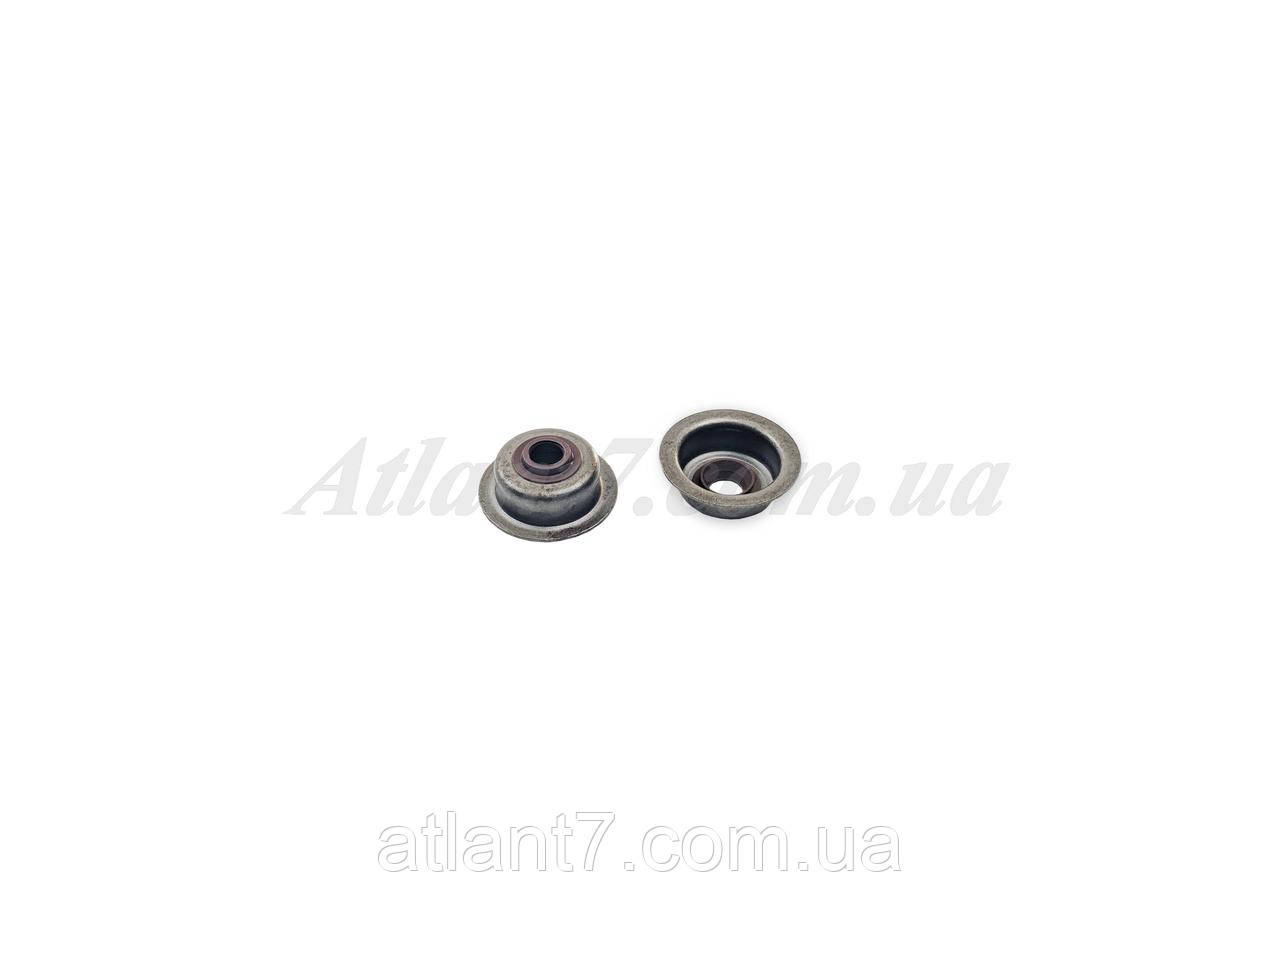 Сальники клапанов мотоблок (бензогенратор) 168f